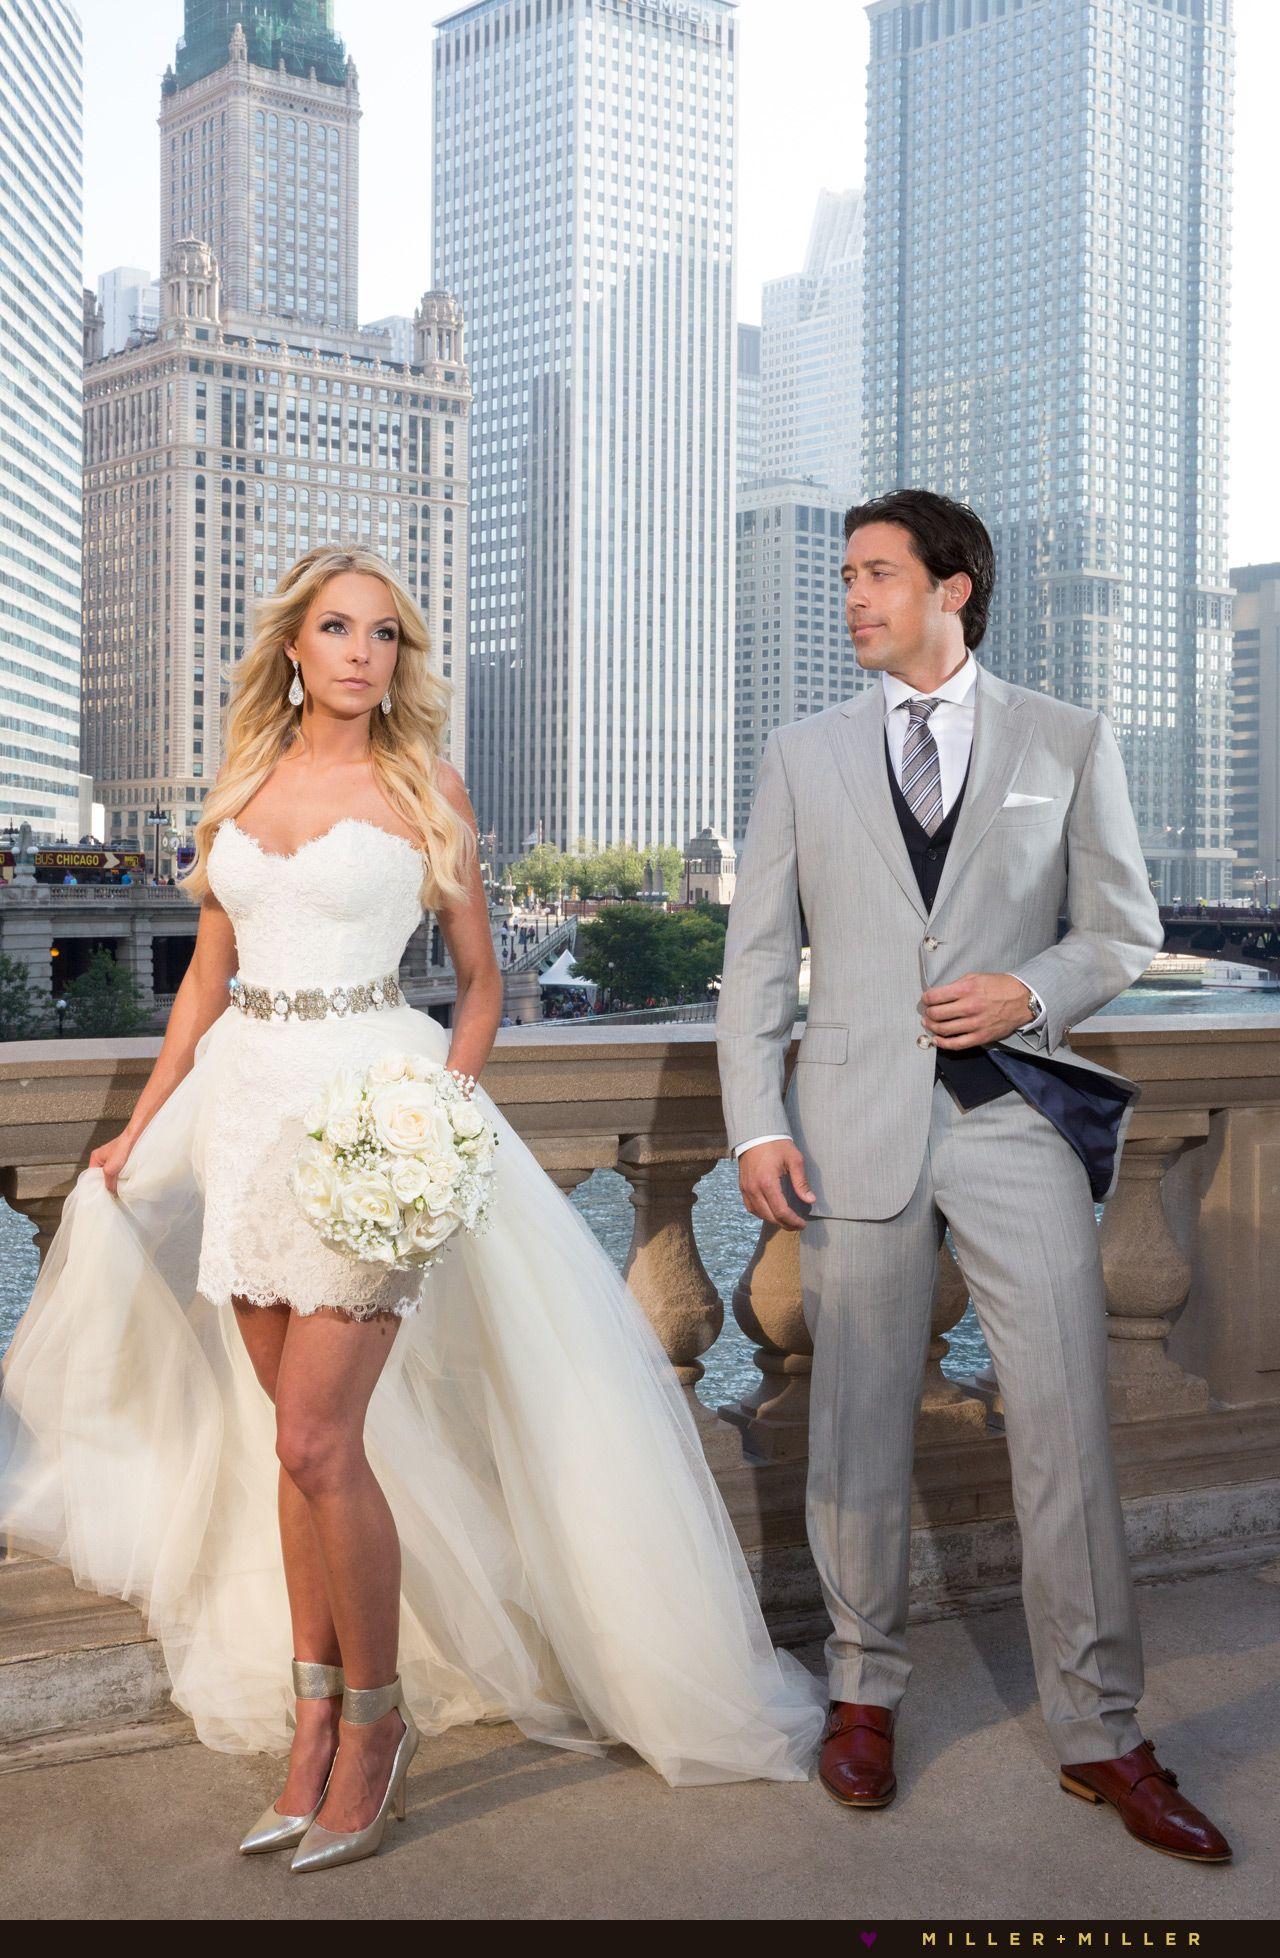 Best Chicago Wedding Photography Photographer Photos